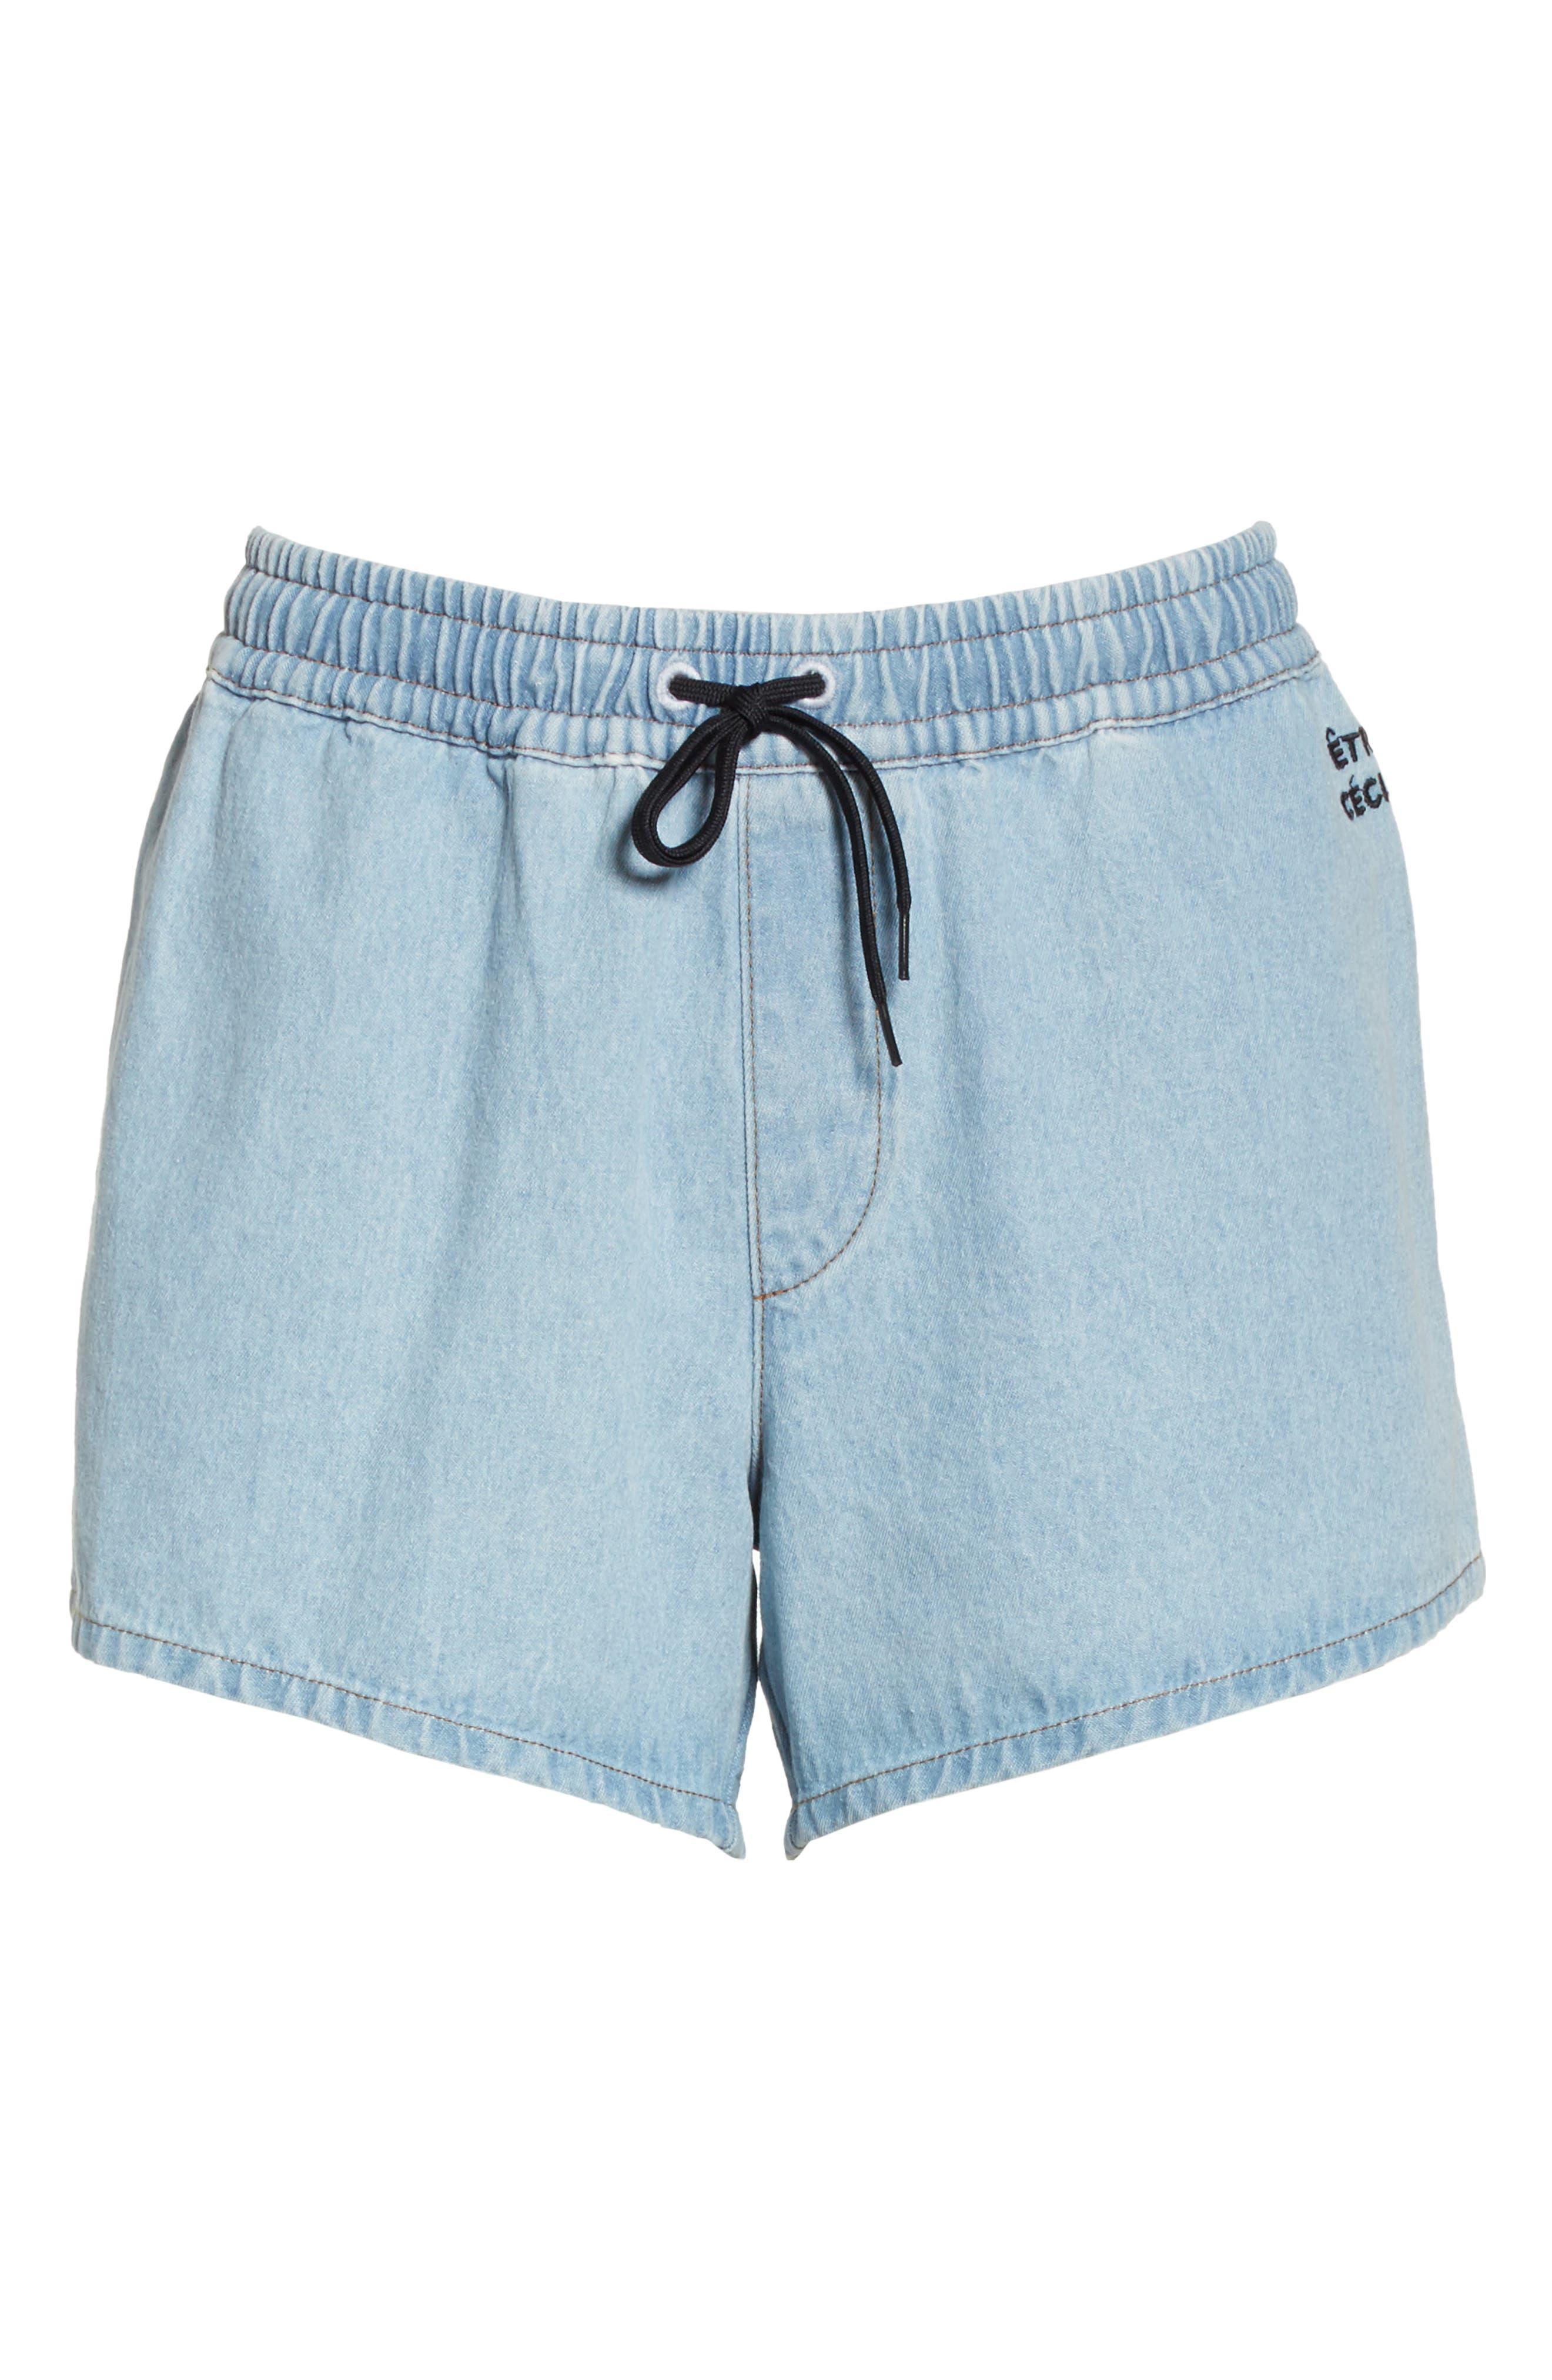 être cécile Rib Retro Shorts,                             Alternate thumbnail 6, color,                             LIGHT BLUE